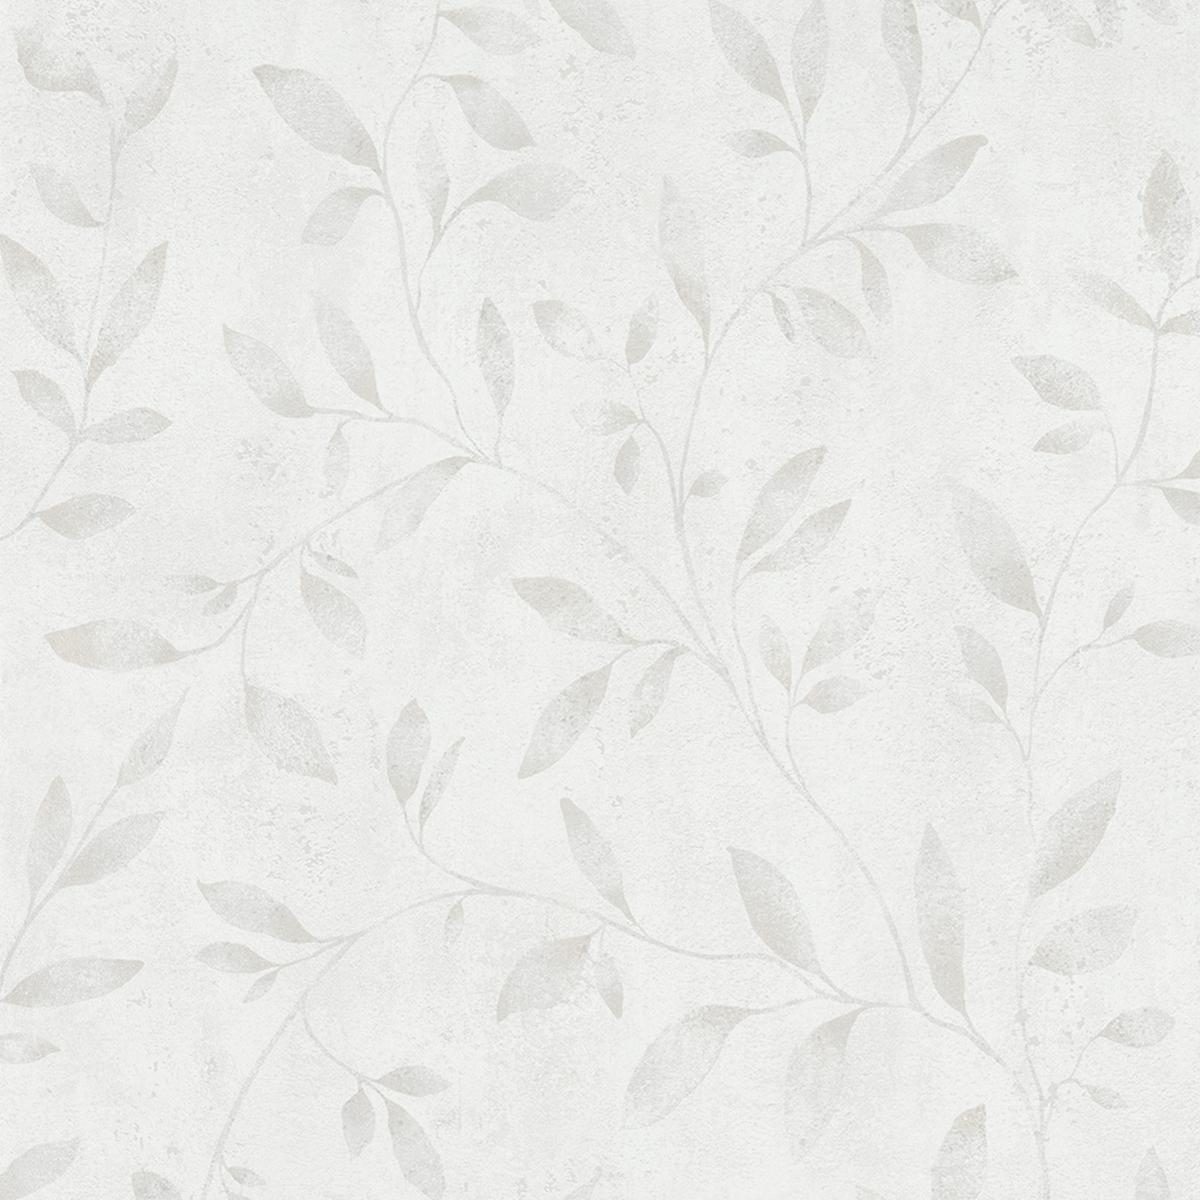 Тапет Ърбан Спейсис сини цветя крем